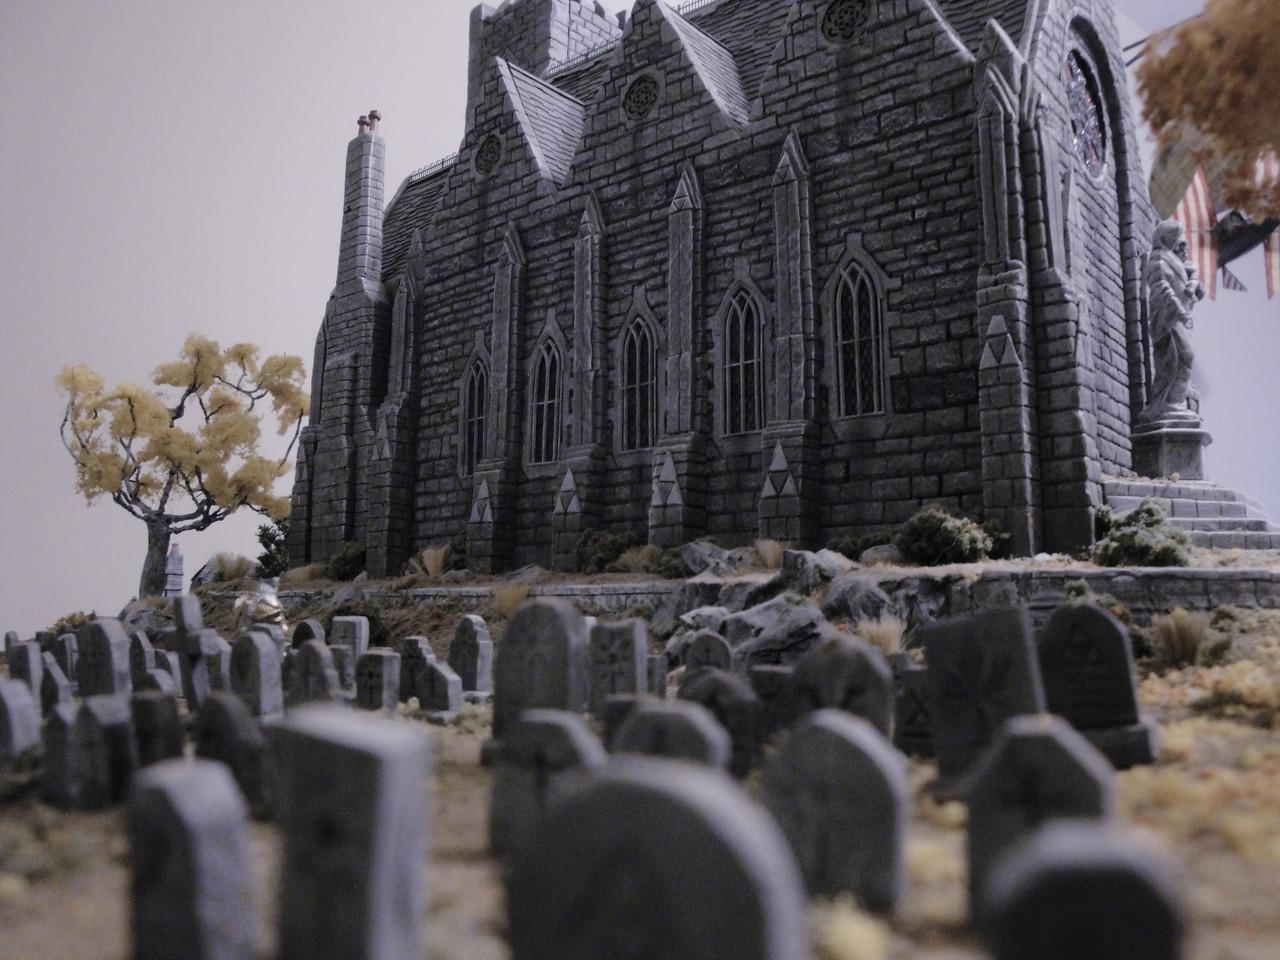 The City of Dunbrough - Page 5 Tumblr_mcqazqe7BF1r4ni7eo1_1280